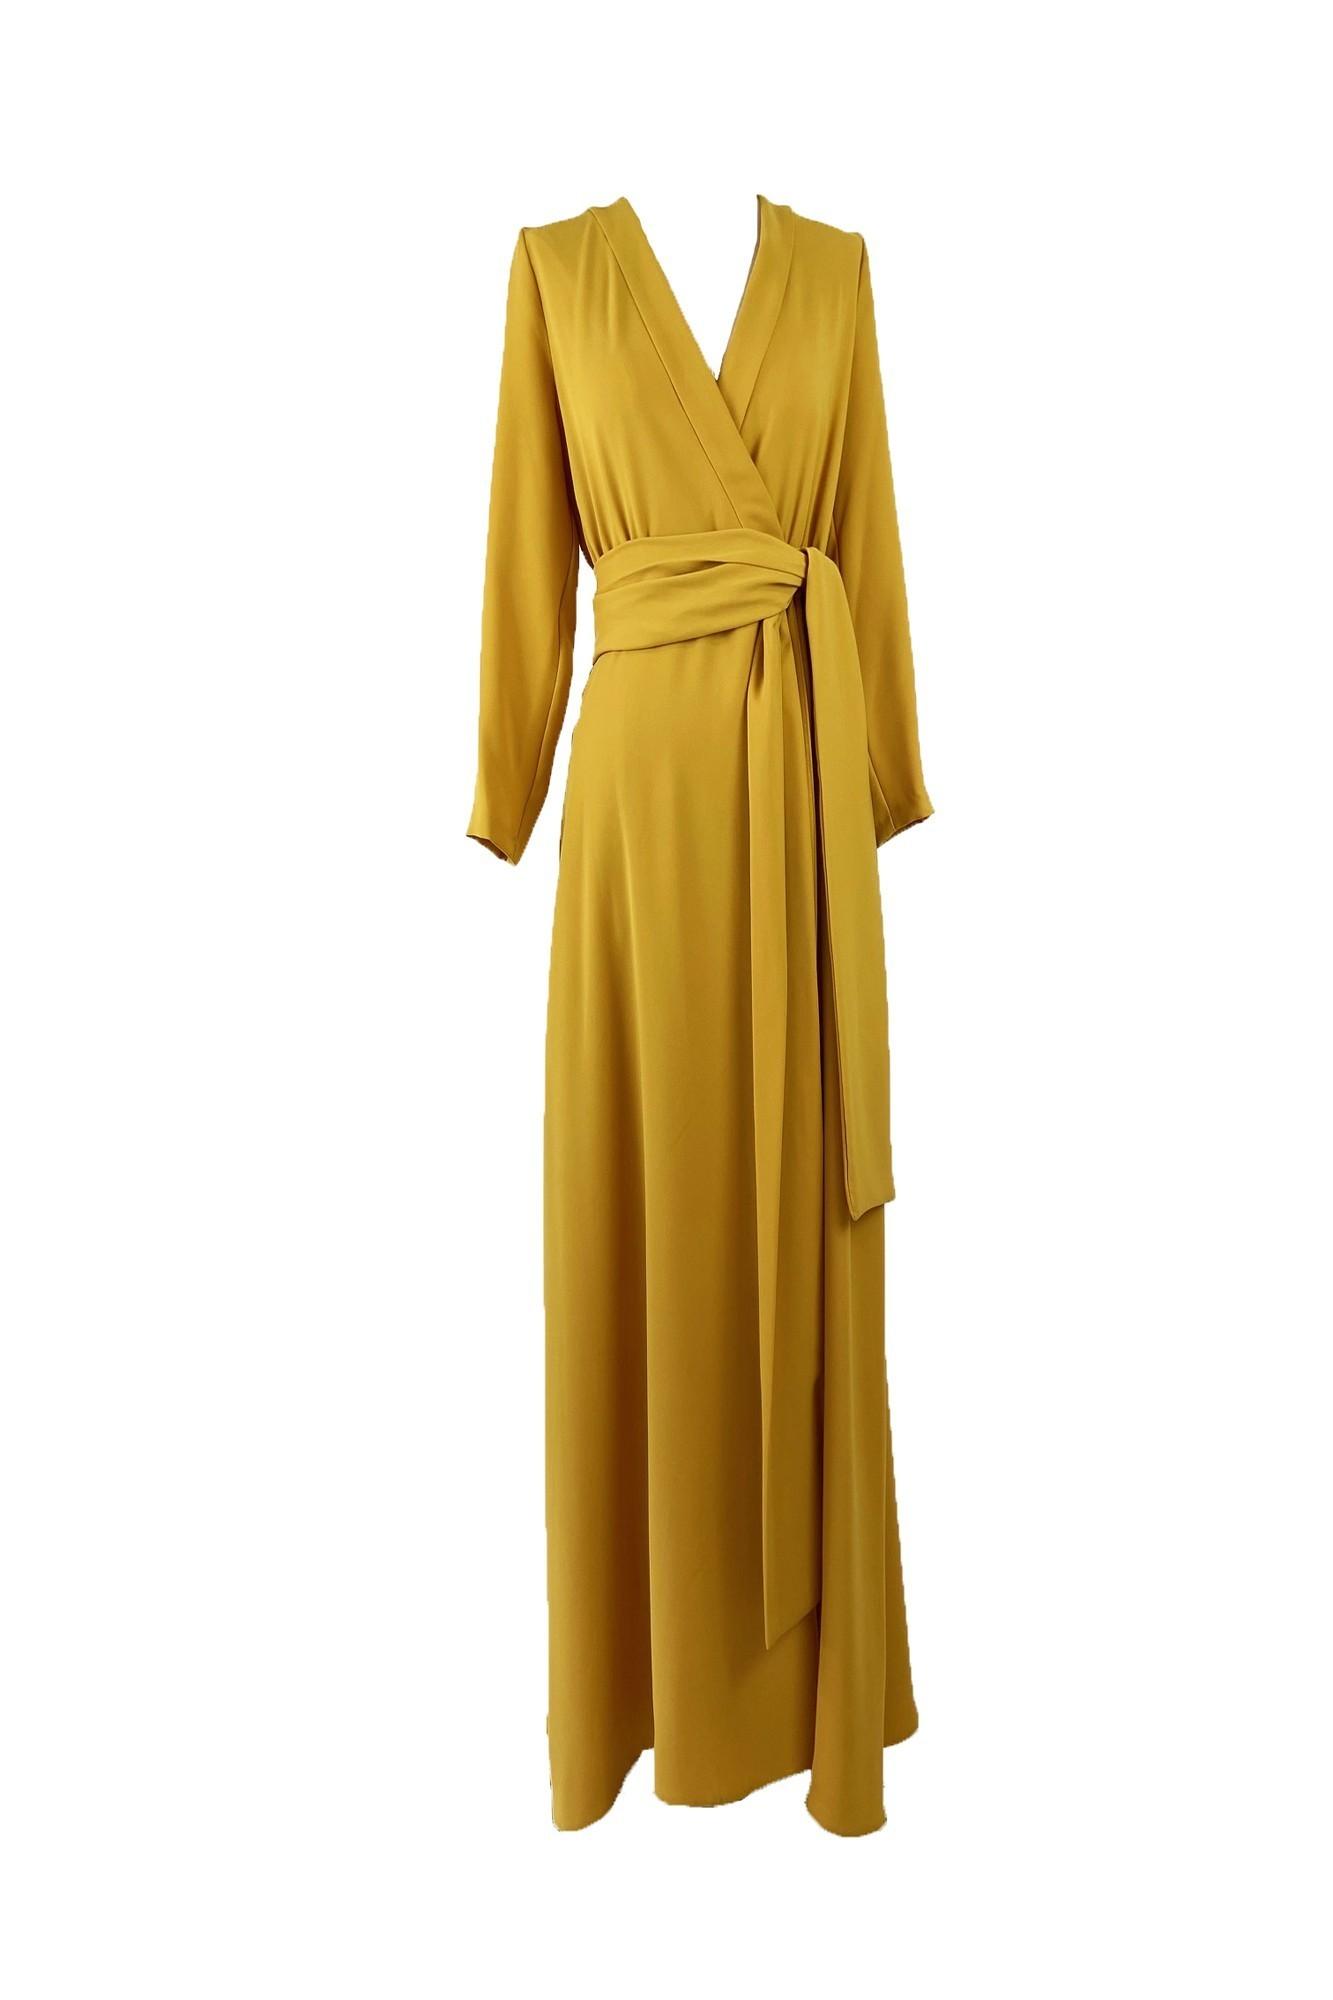 ALEJANDRA YELLOW DRESS